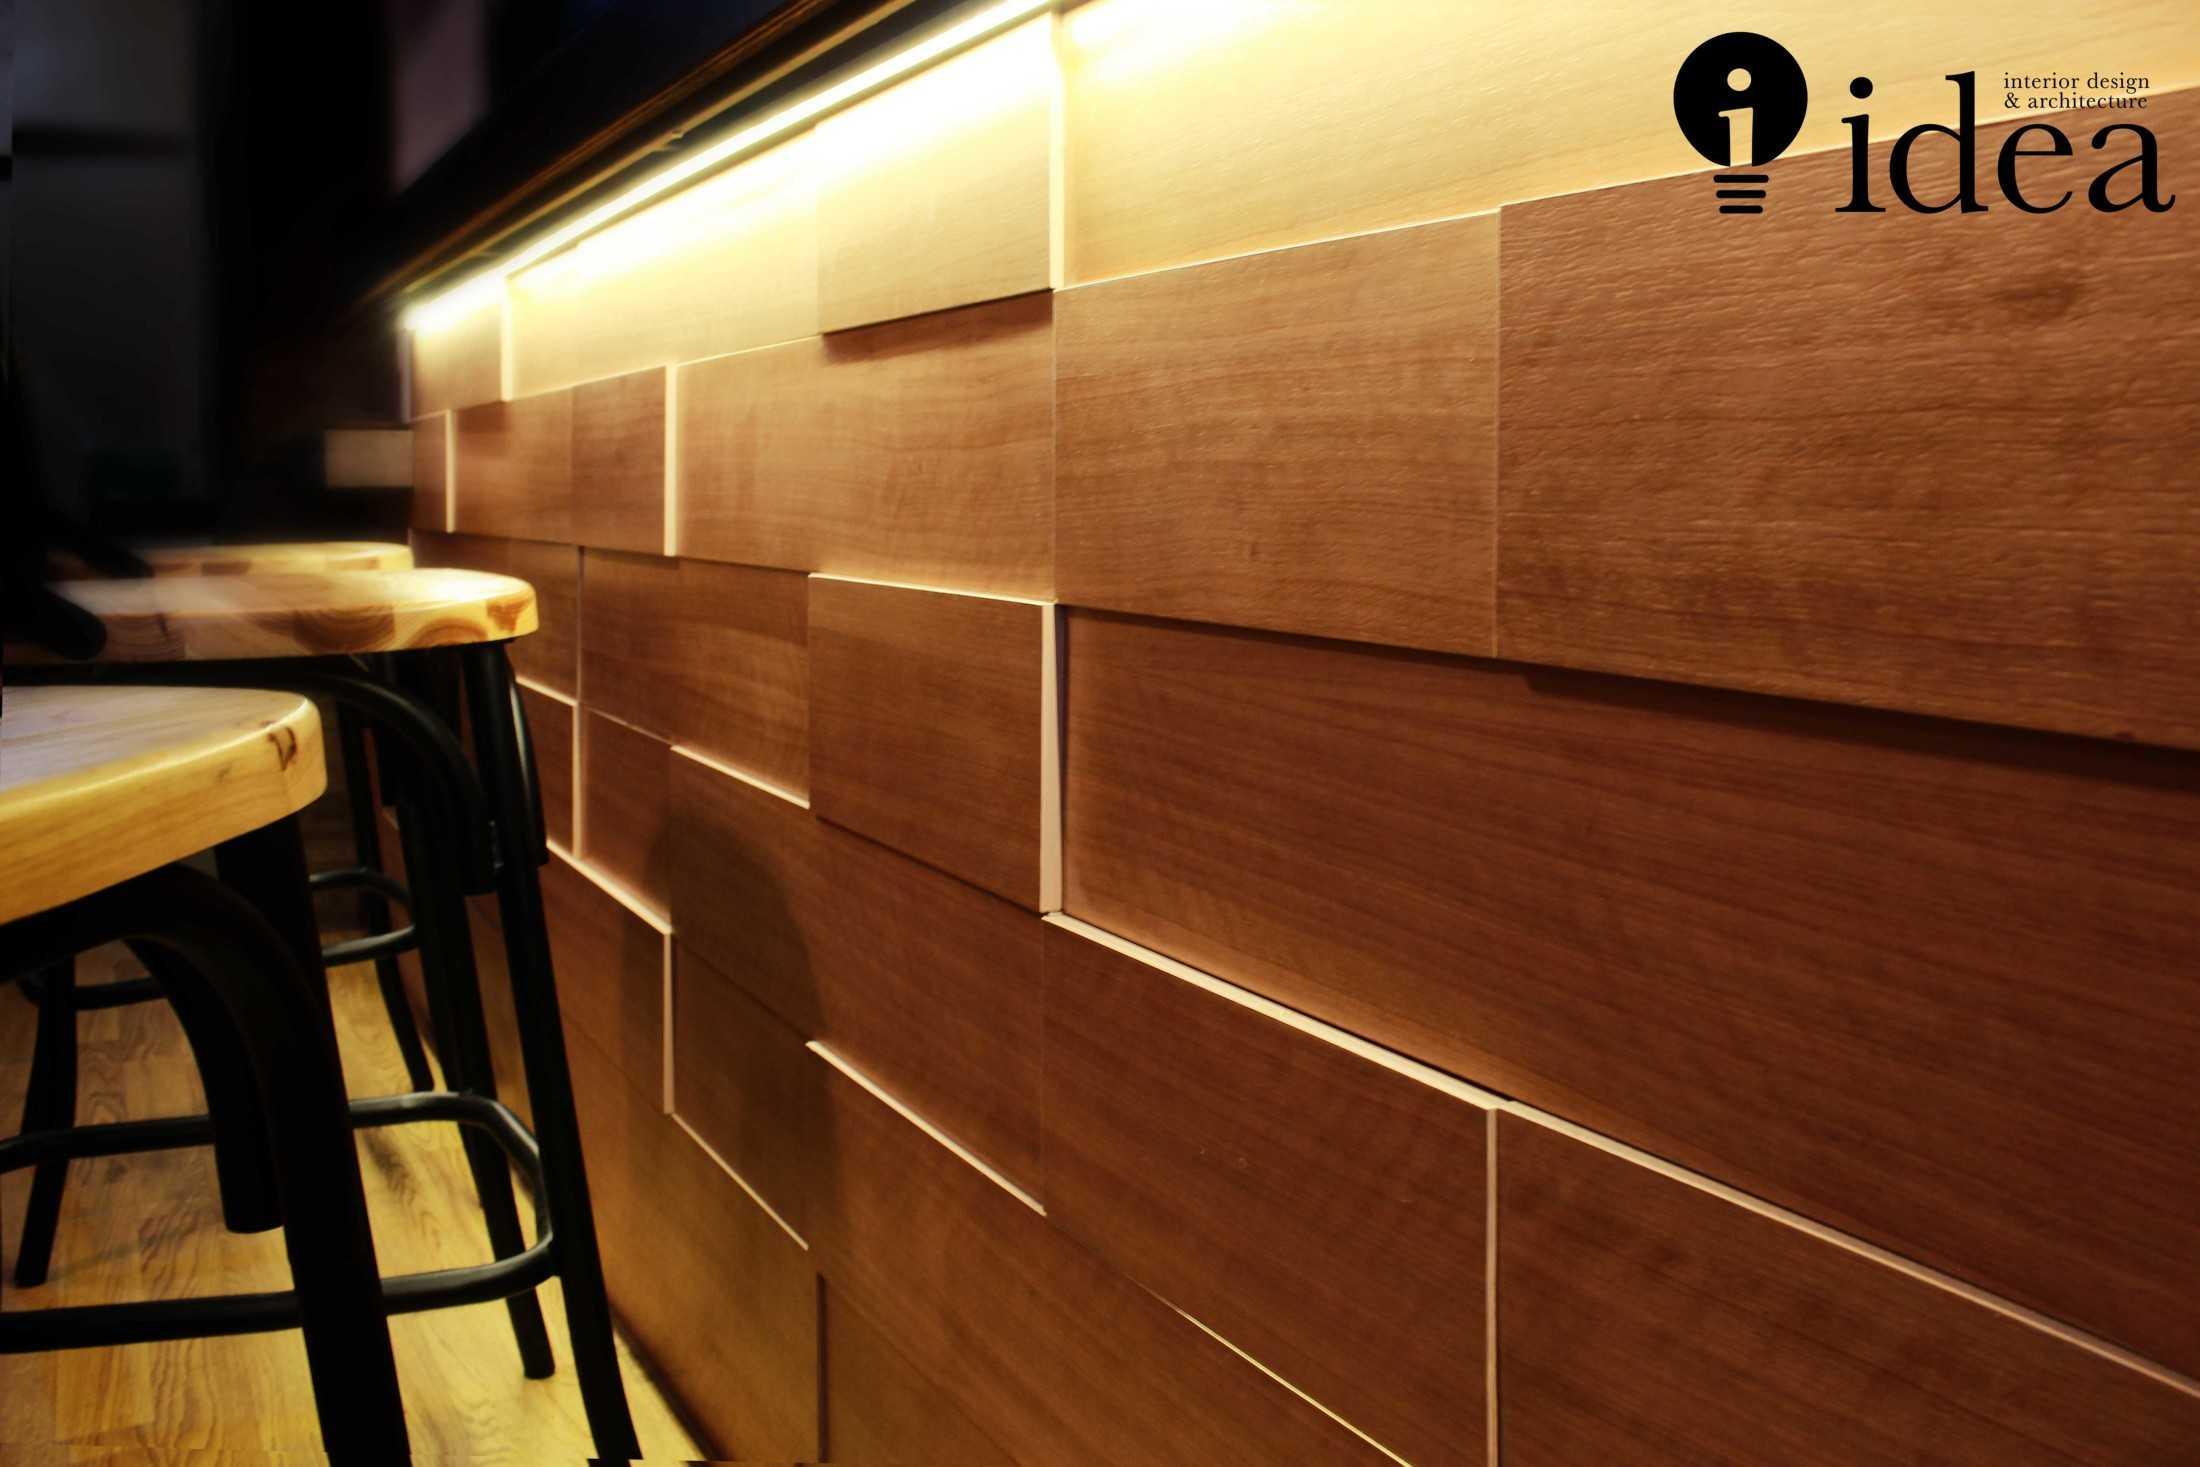 Idea Studio Coffee Bar - Nyonya Attha Surabaya, Kota Sby, Jawa Timur, Indonesia Surabaya, Kota Sby, Jawa Timur, Indonesia Idea-Studio-Coffee-Bar-Nyonya-Attha  79937